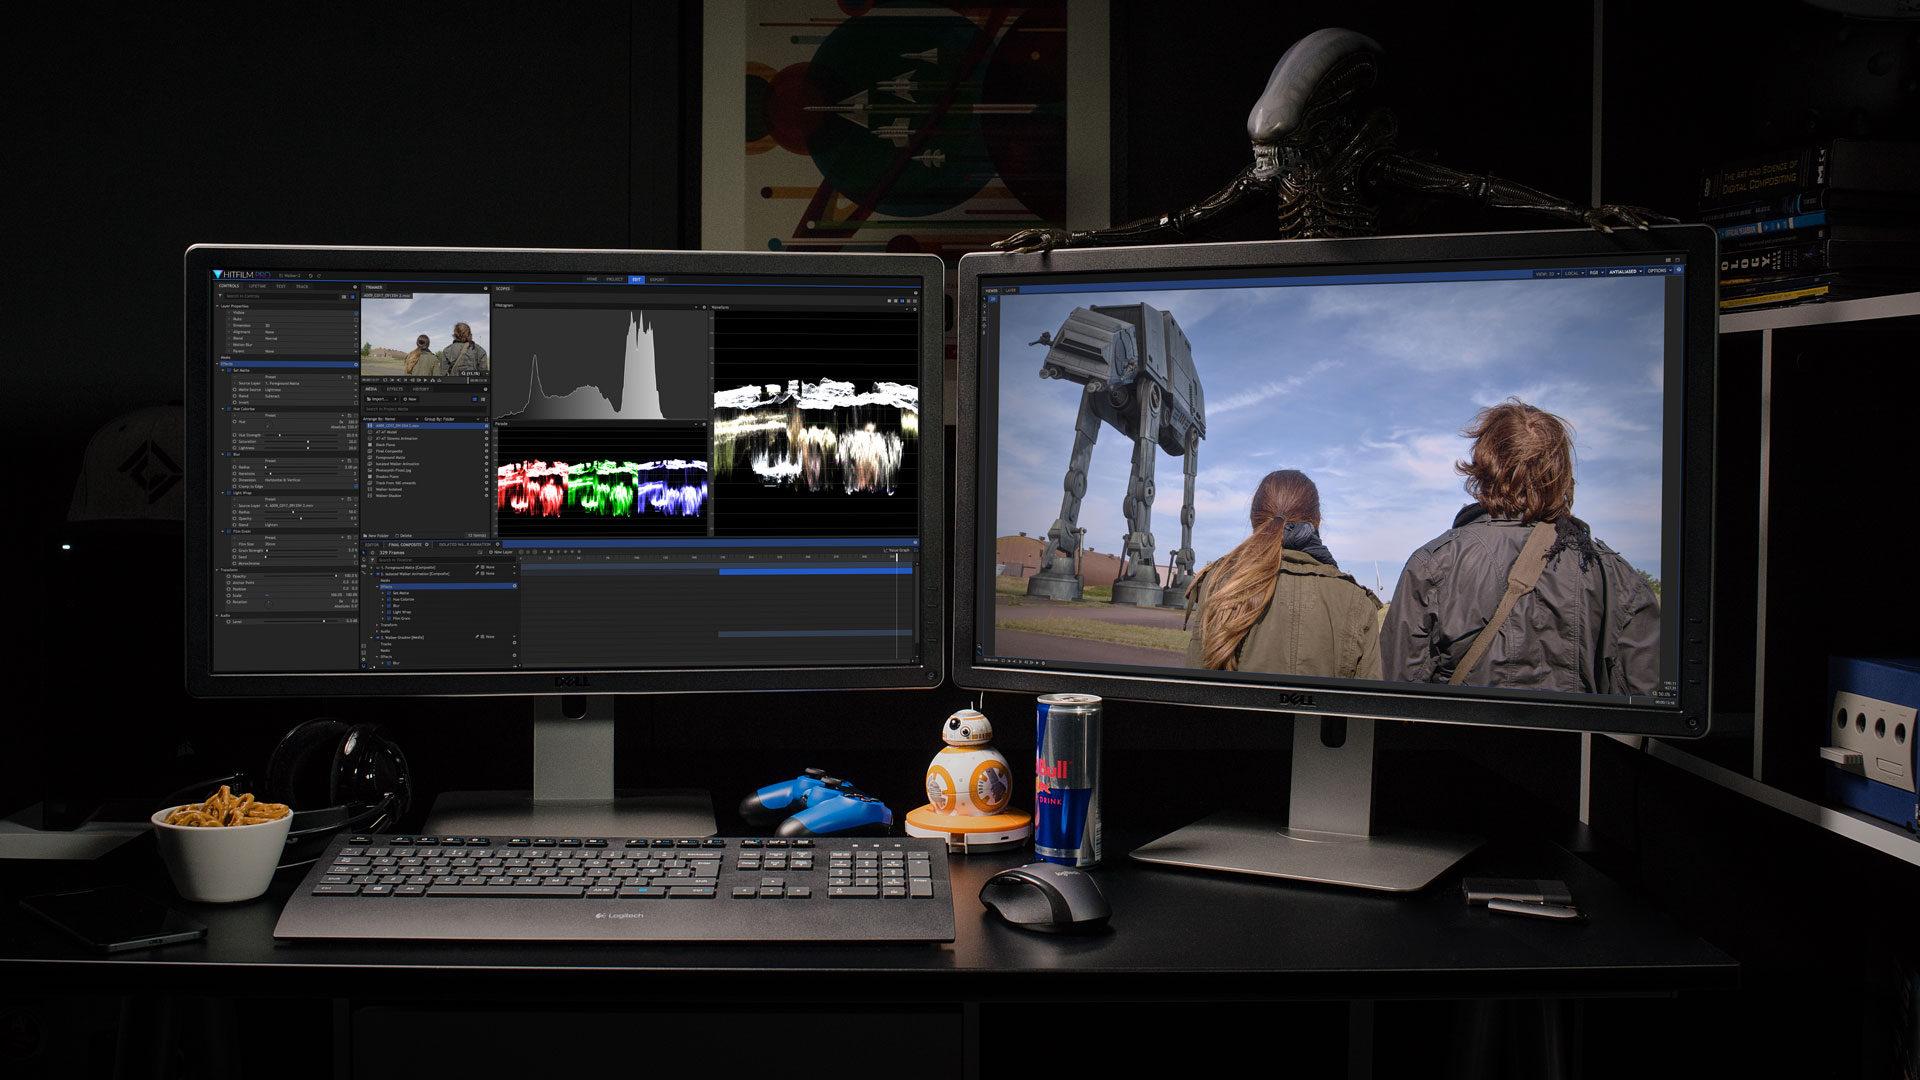 HitFilm Pro 2017 interface on dual monitor PC